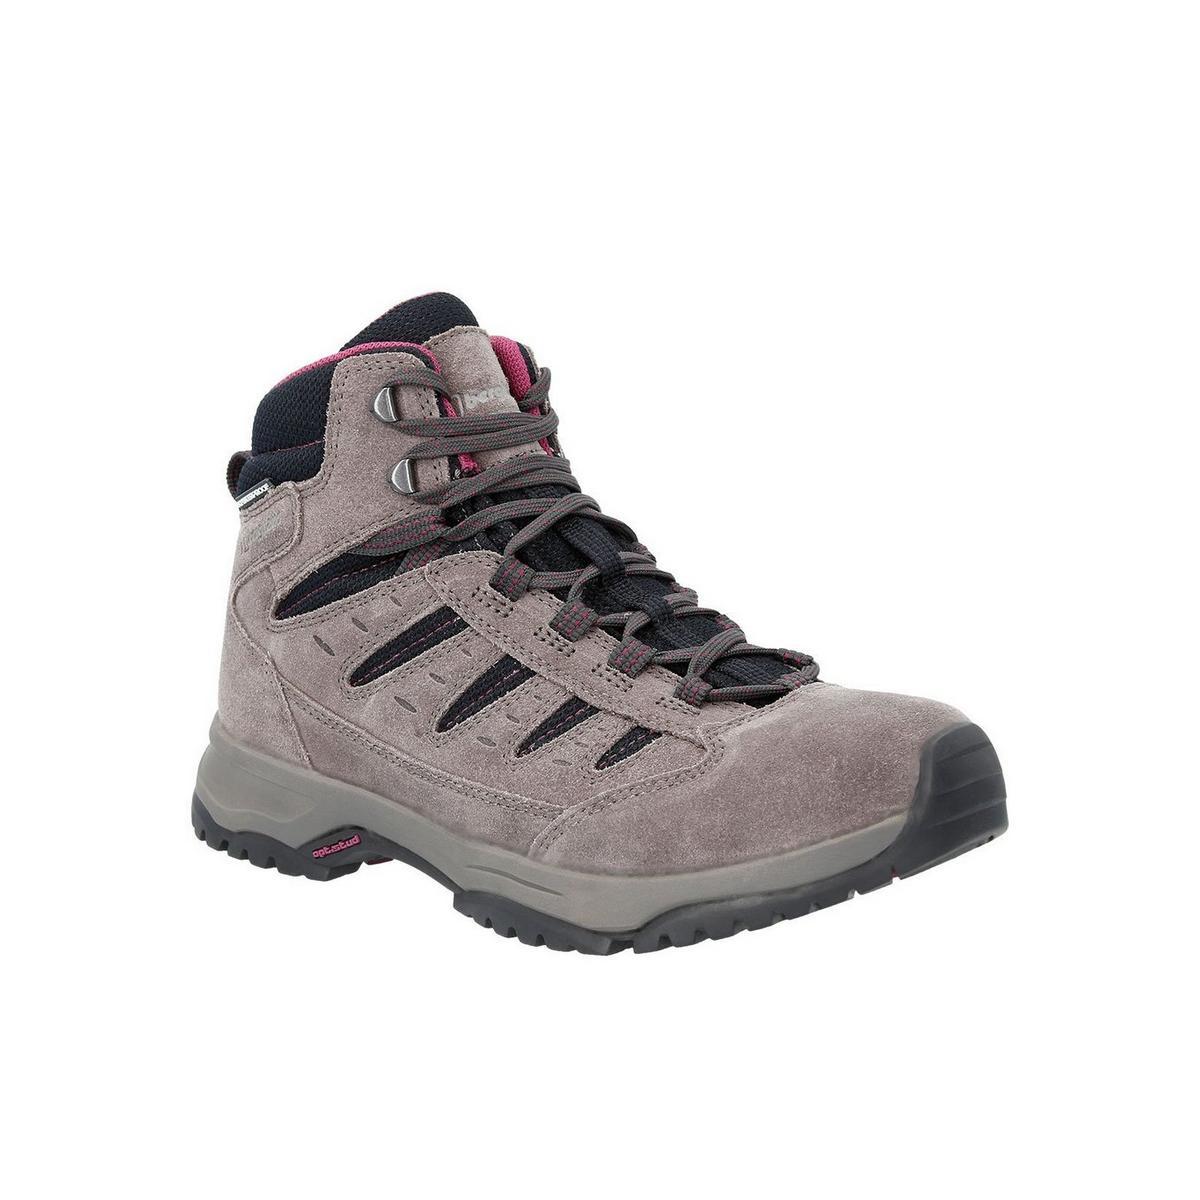 Berghaus Women's Expeditor Trek 2.0 Walking Boots